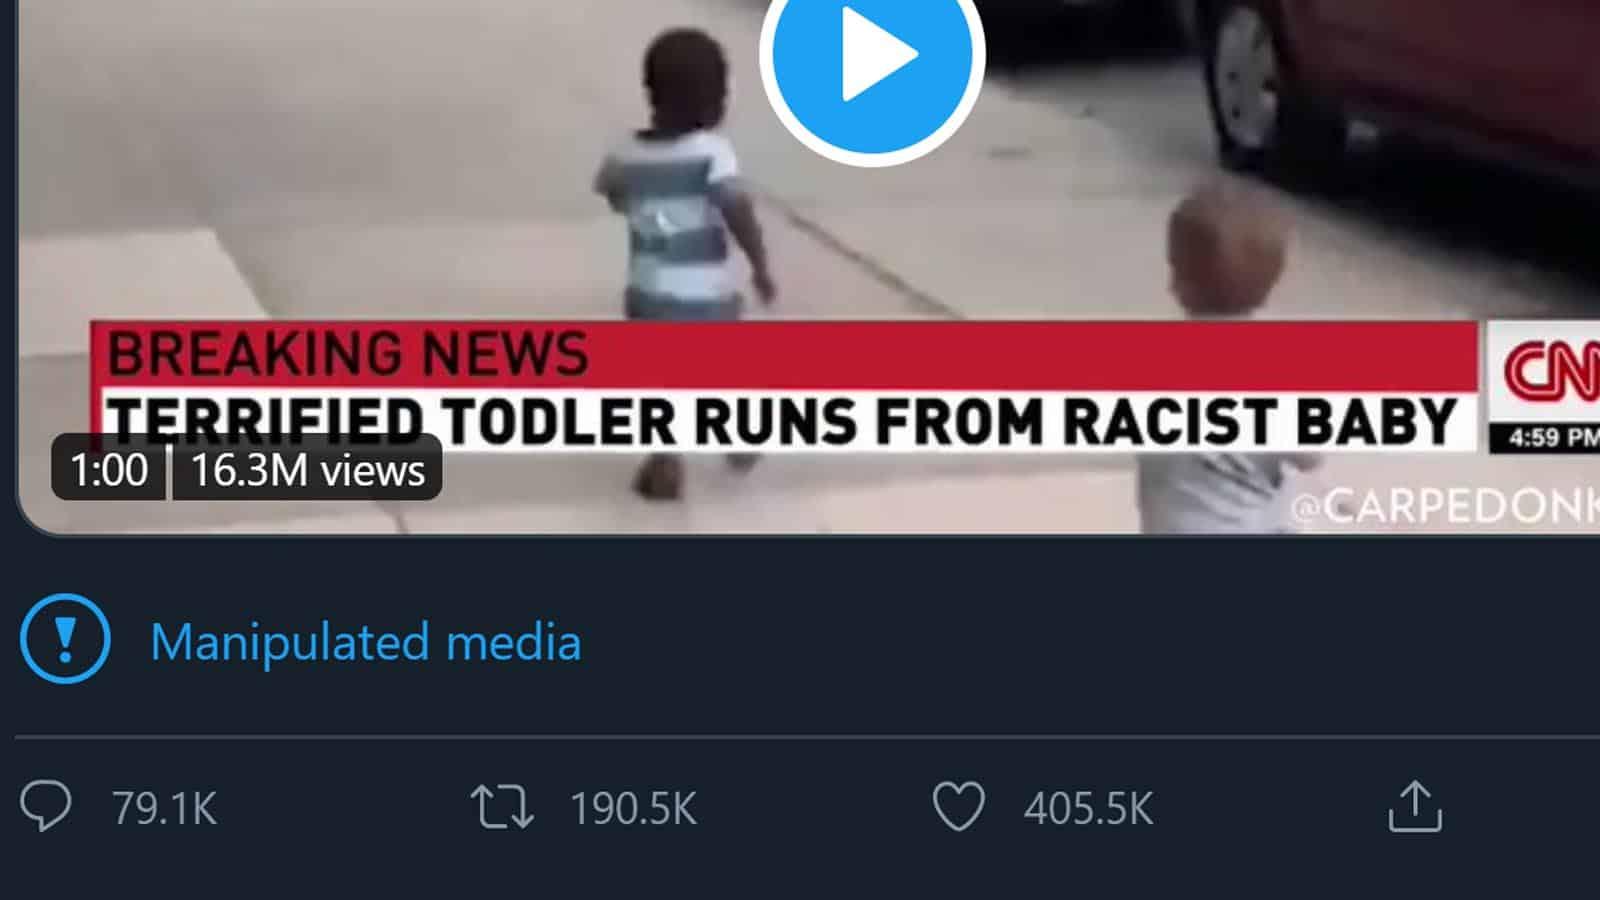 donald trump manipulated media tweet